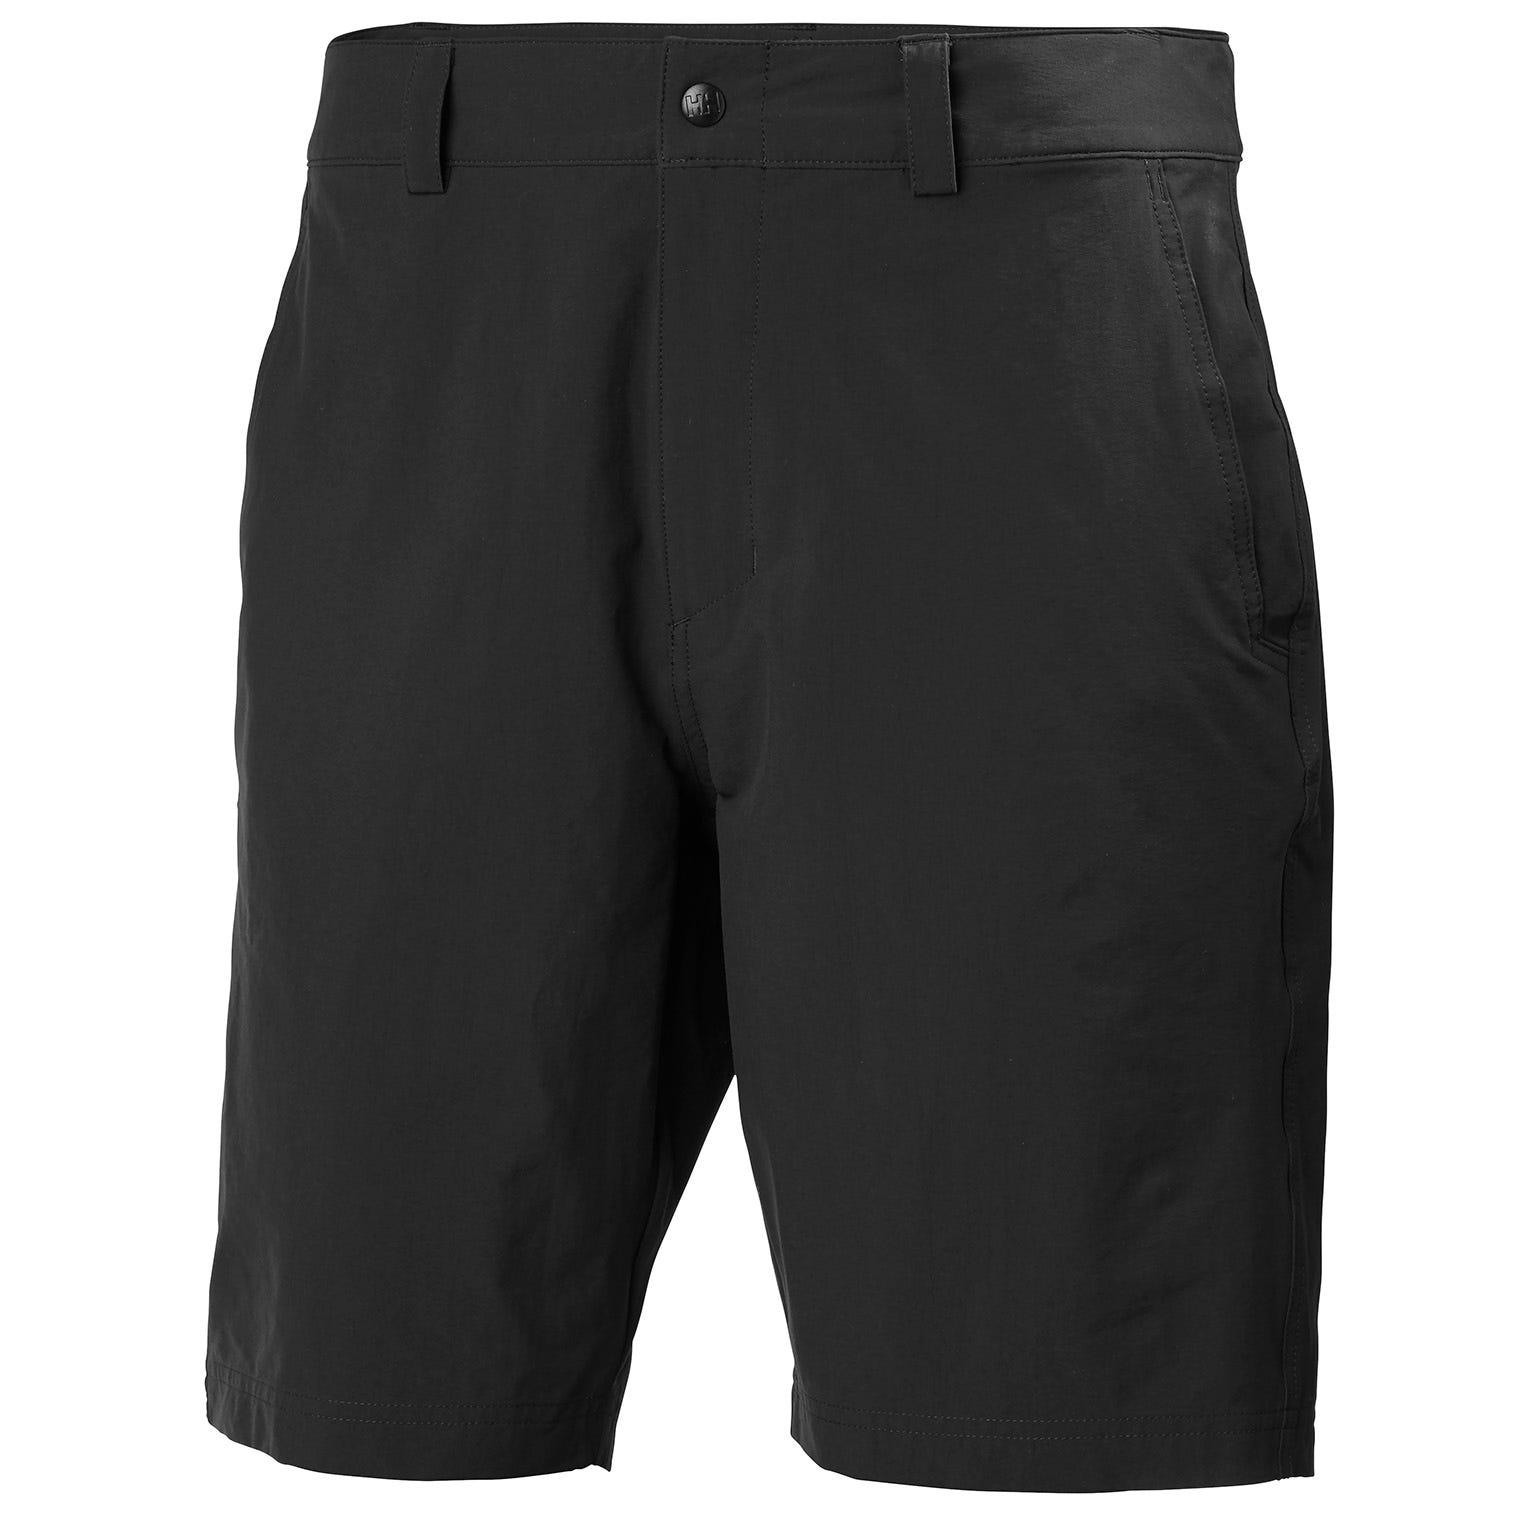 "Helly Hansen Hp Qd Club Shorts 10"" Mens Sailing Pant Black 32"